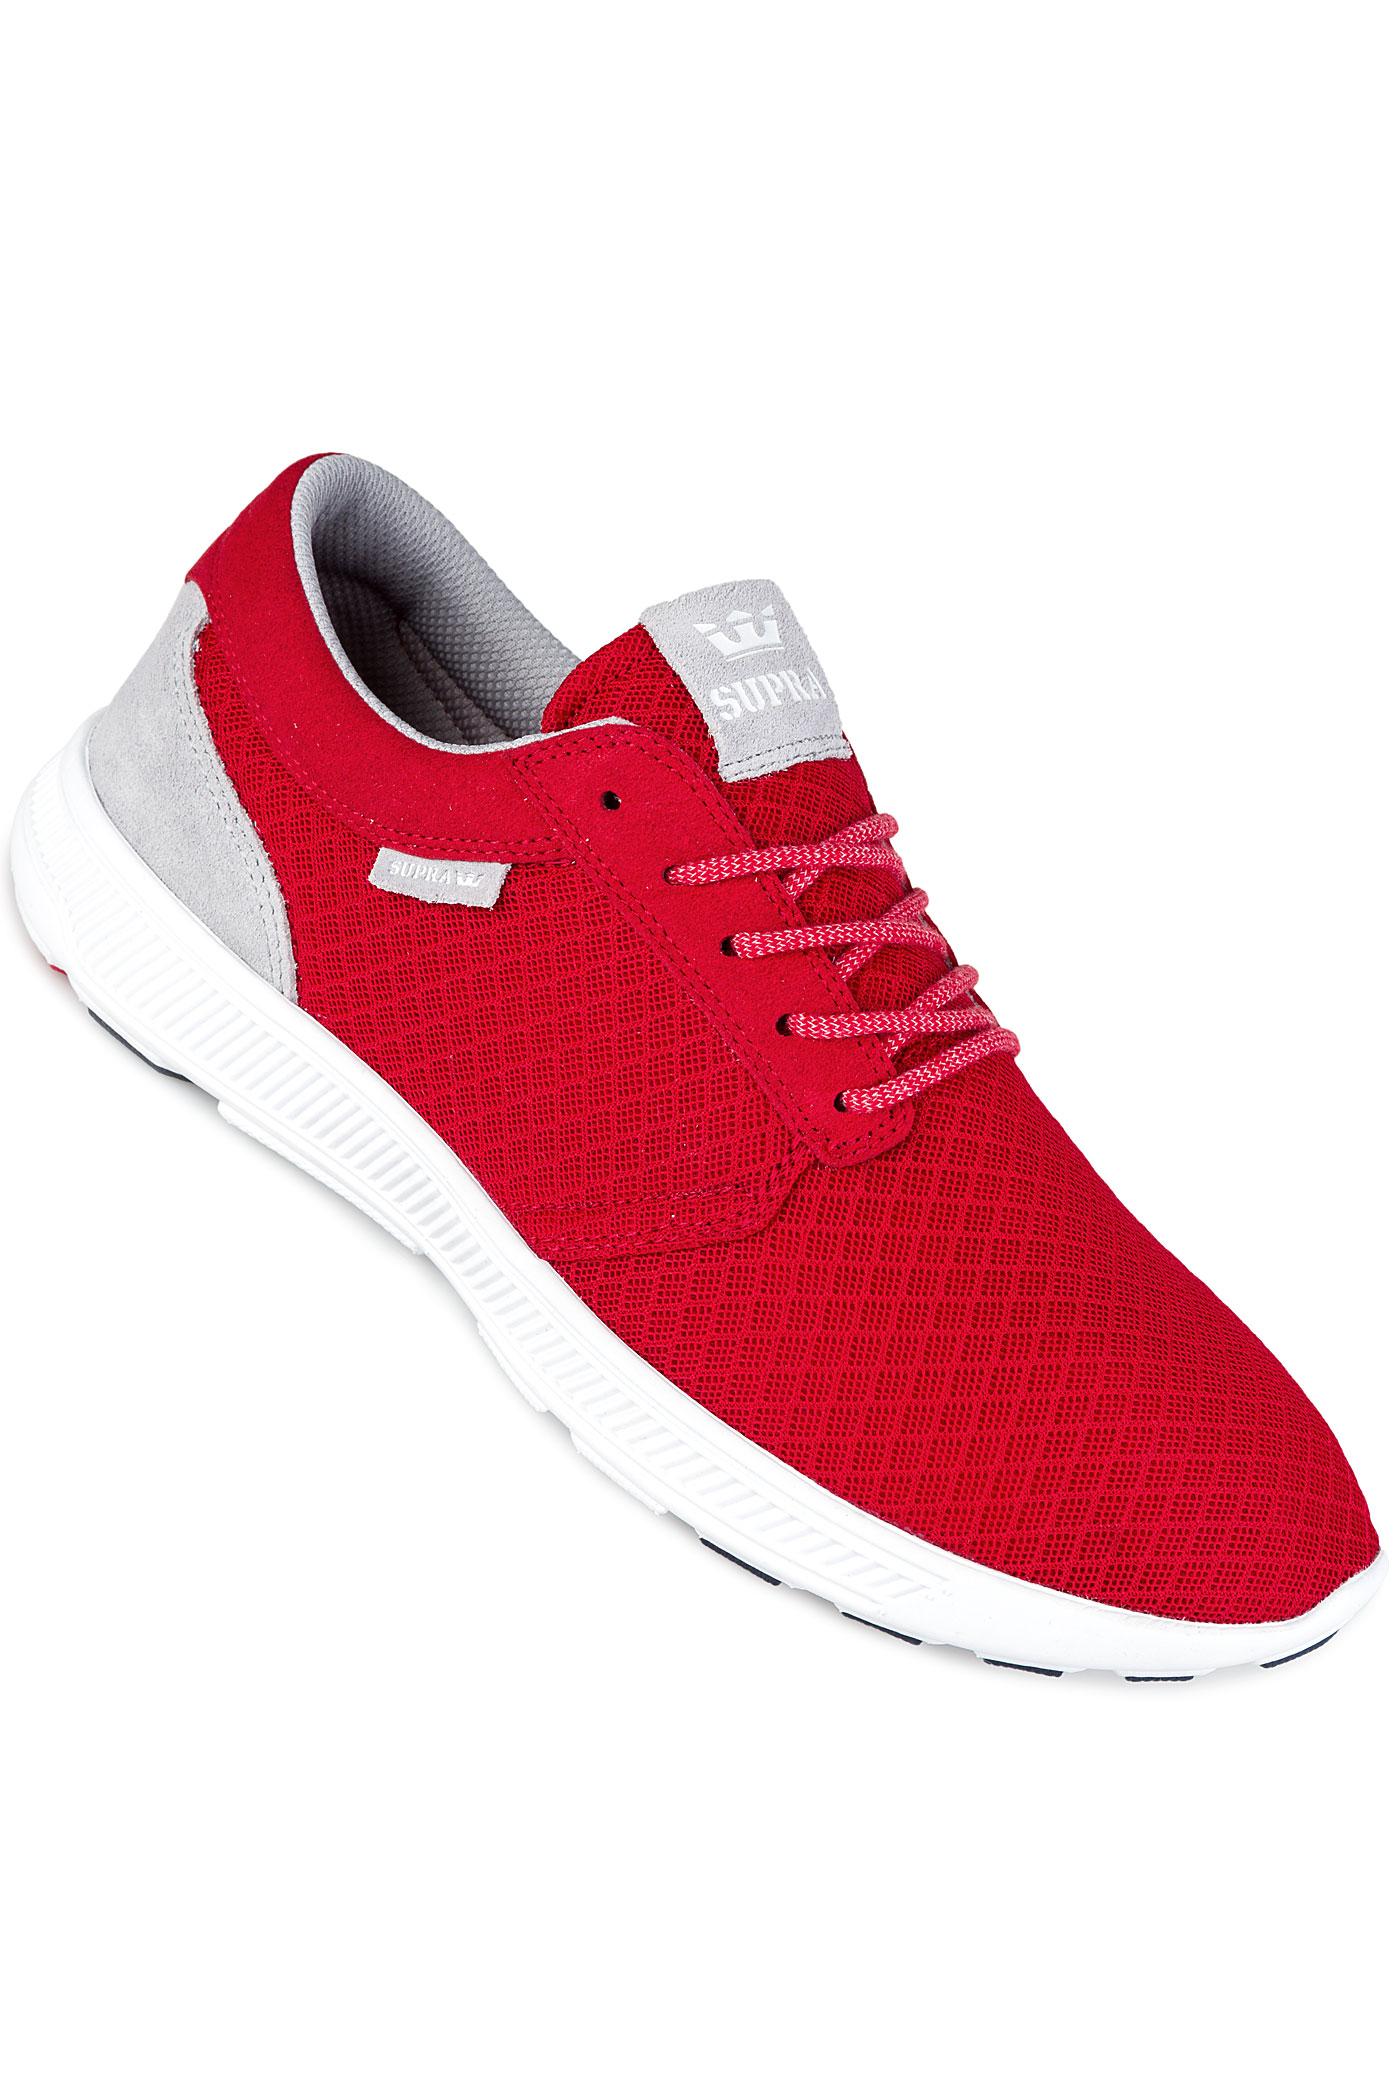 supra hammer run shoes red white buy at skatedeluxe. Black Bedroom Furniture Sets. Home Design Ideas